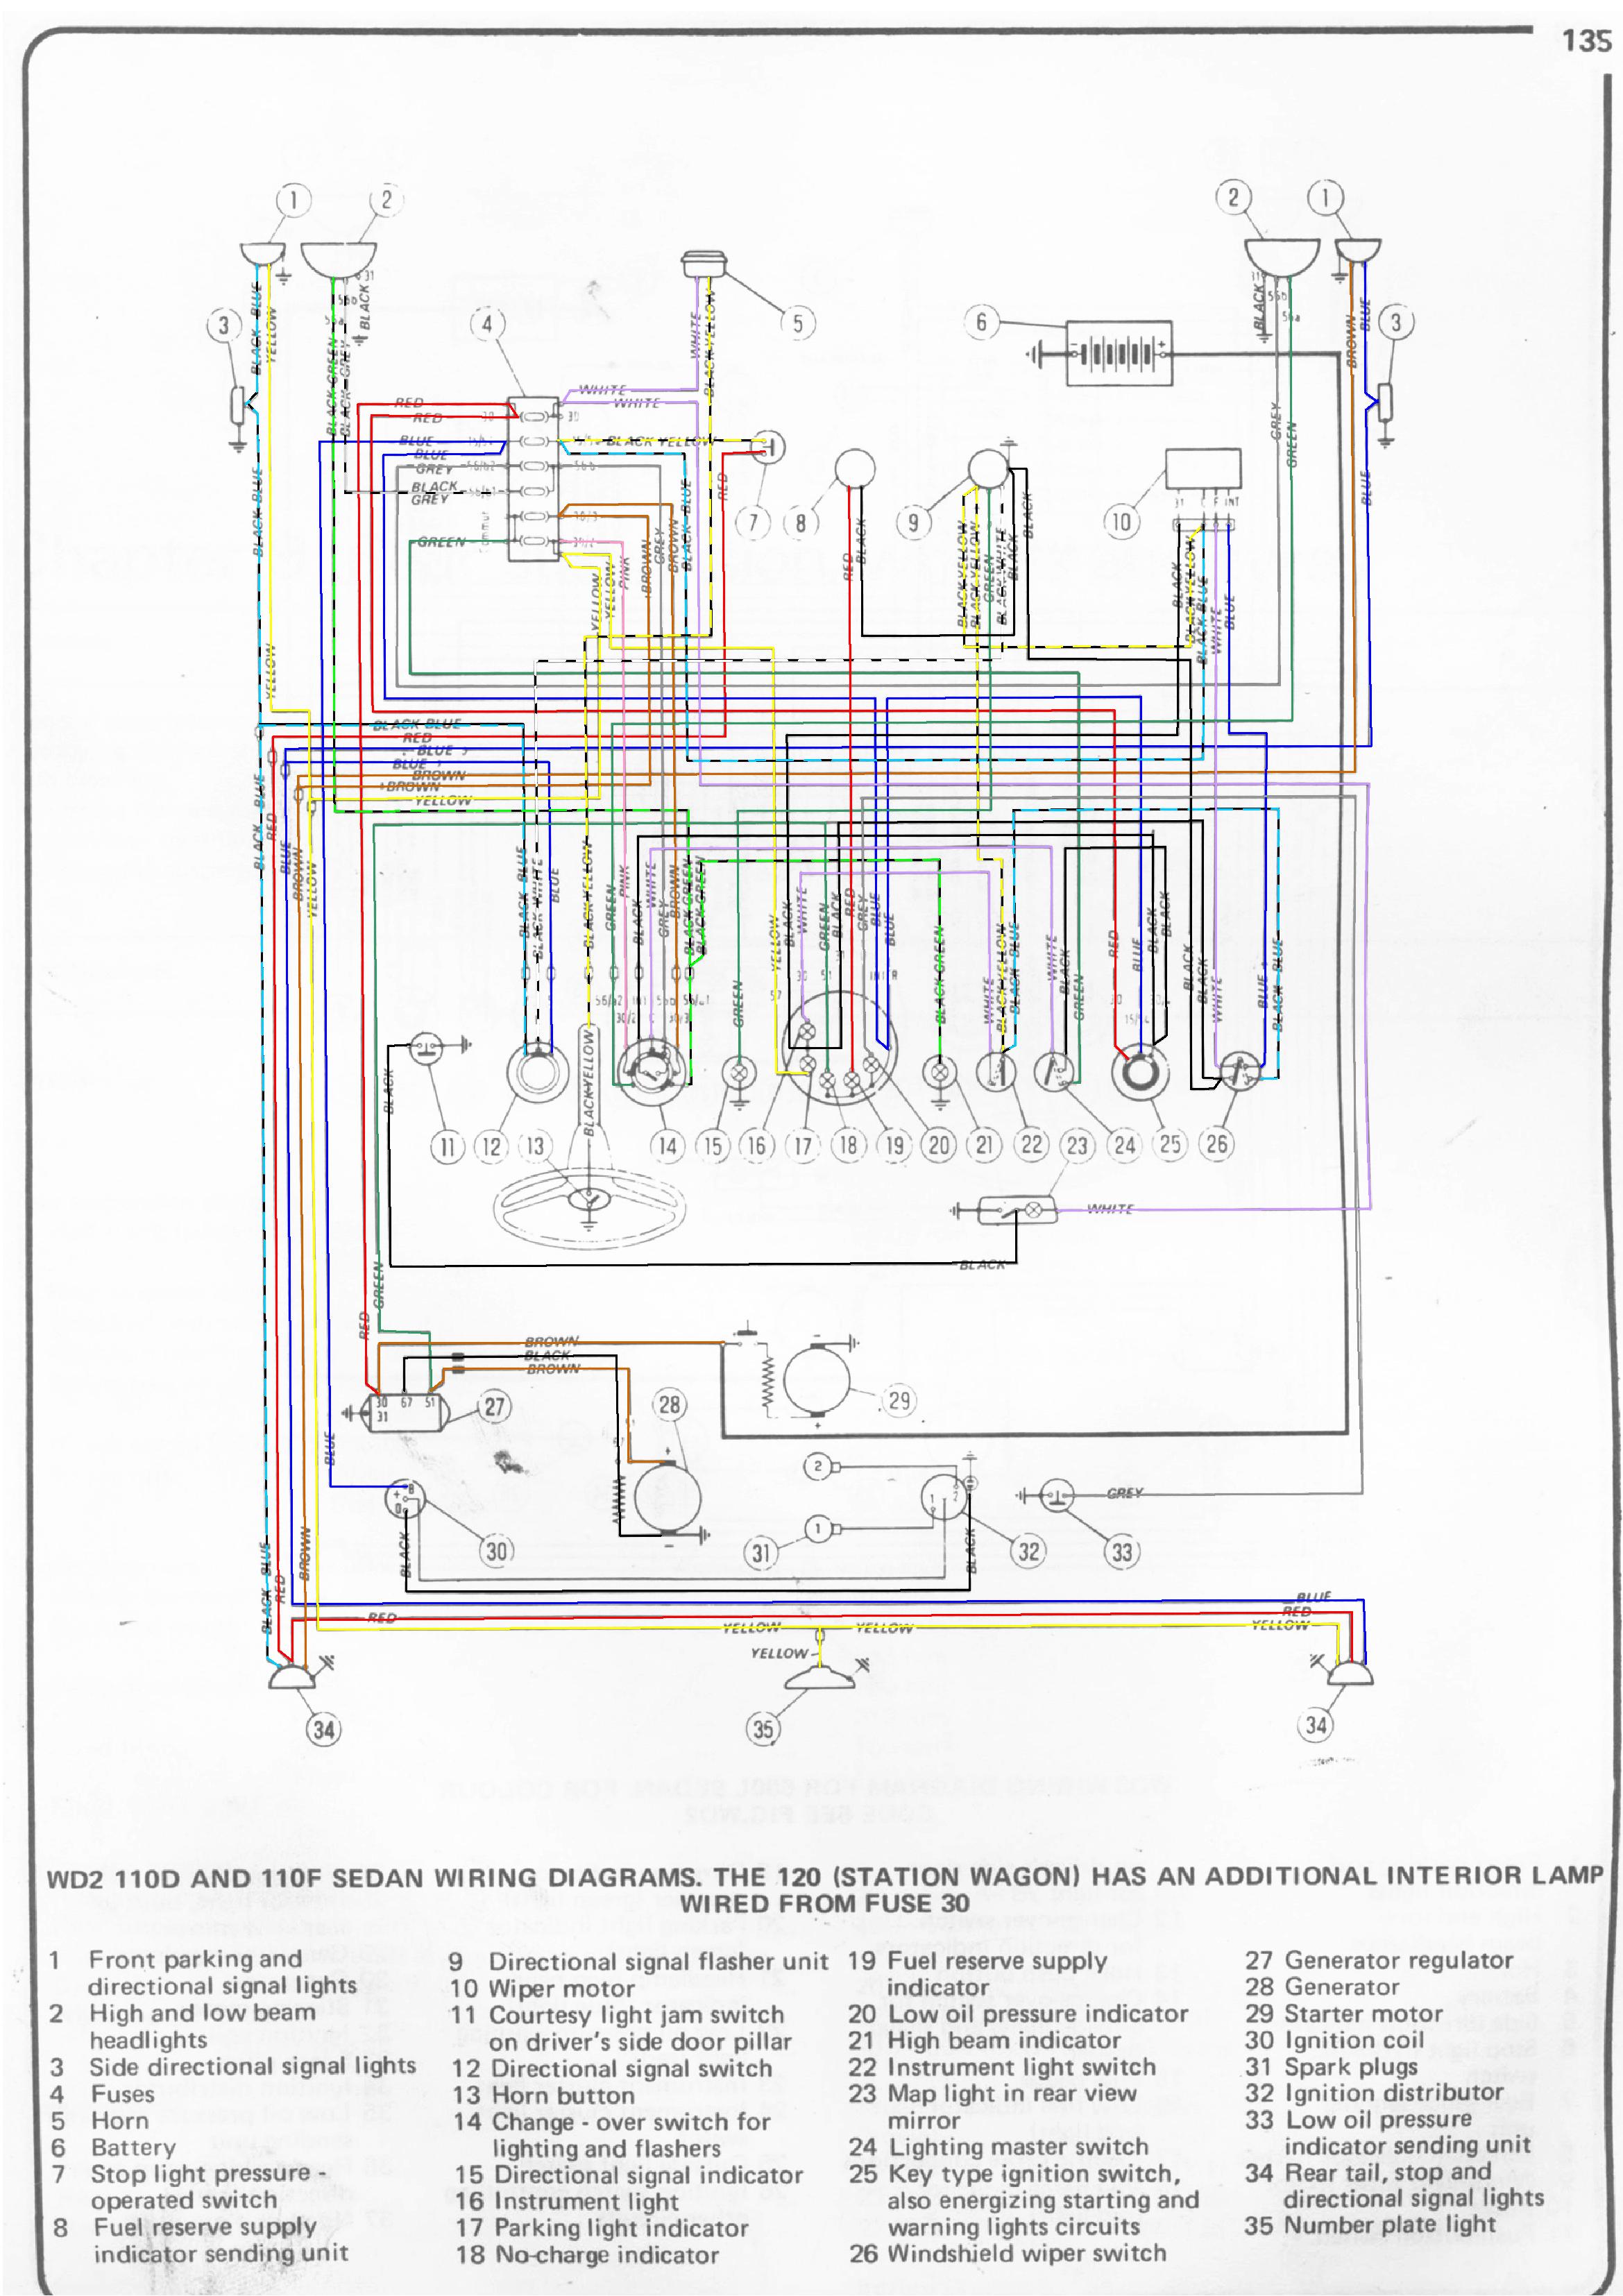 Apc Matrix 500 Wiring Diagram Electrical Schematics Trusted Diagrams Hewlett Packard